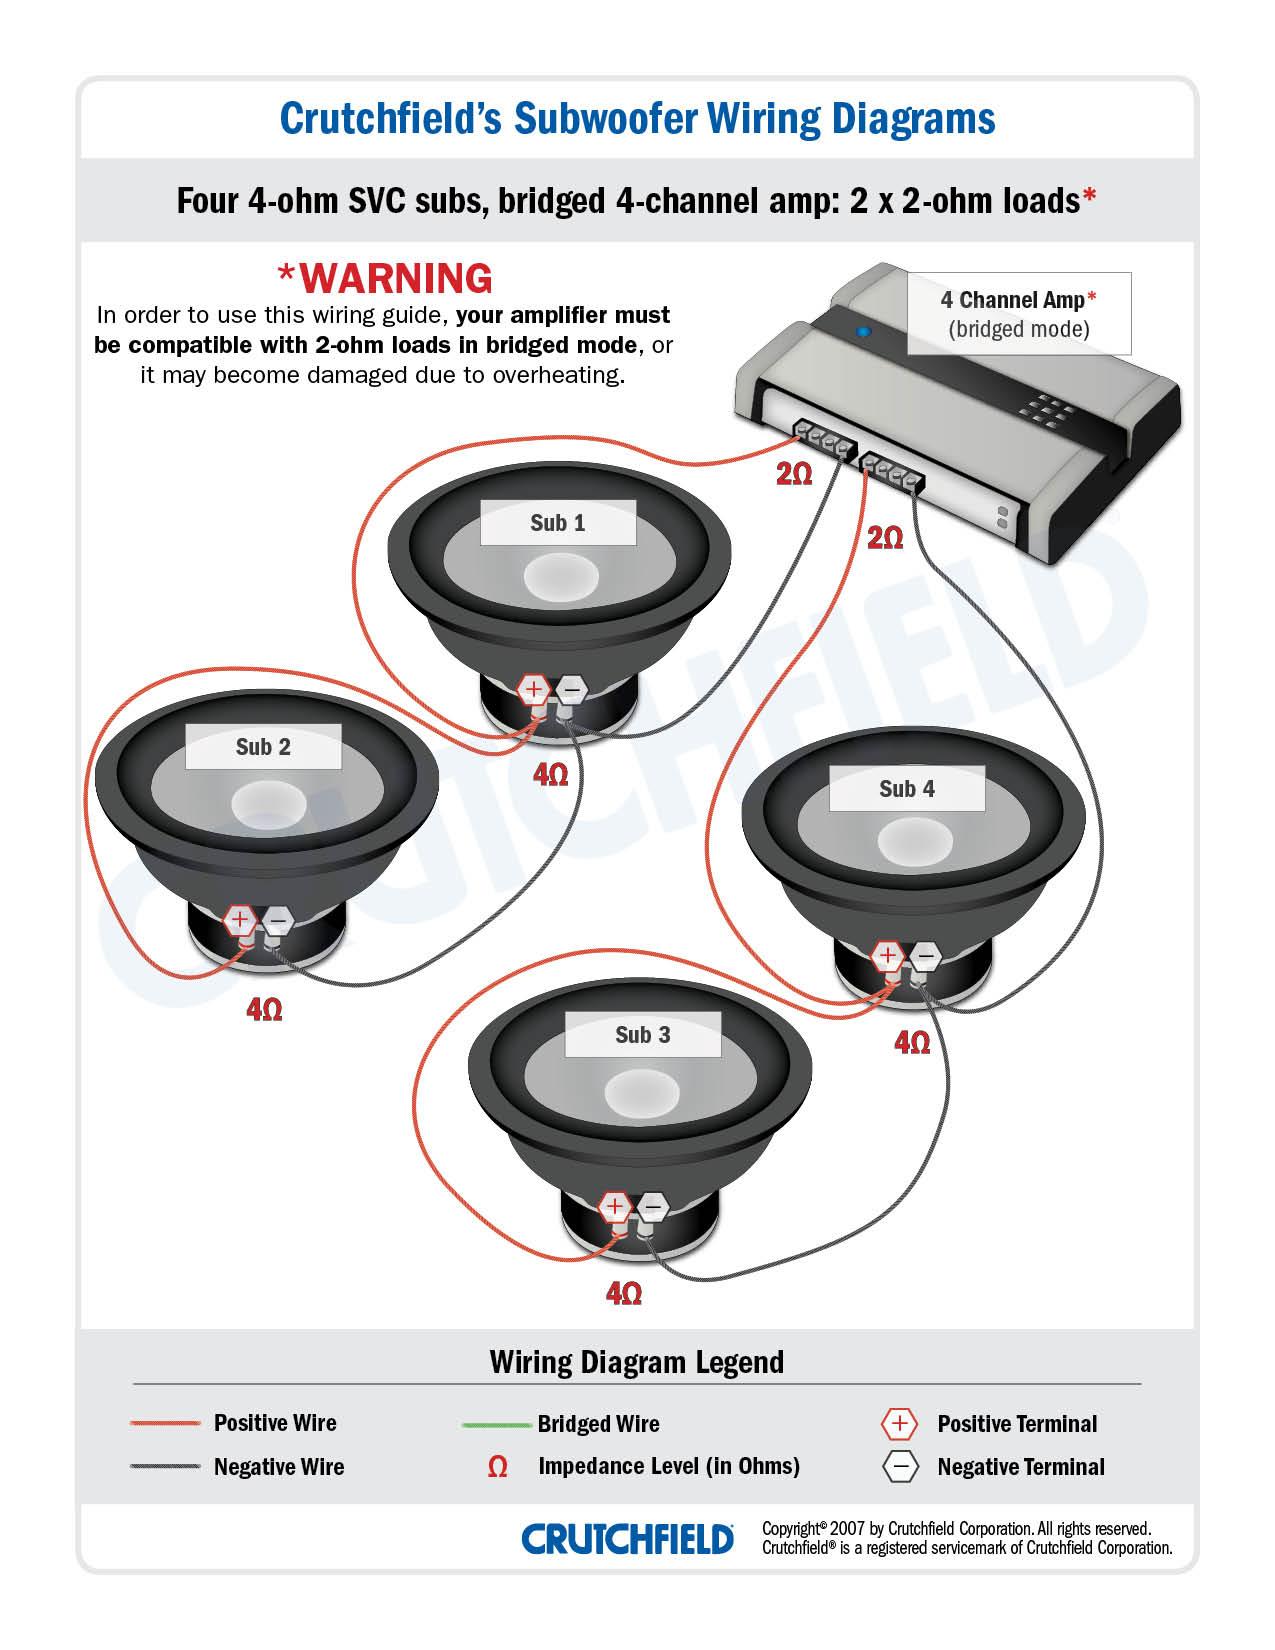 Ohm Wiring Diagram | Wiring Diagram - 4 Ohm Wiring Diagram